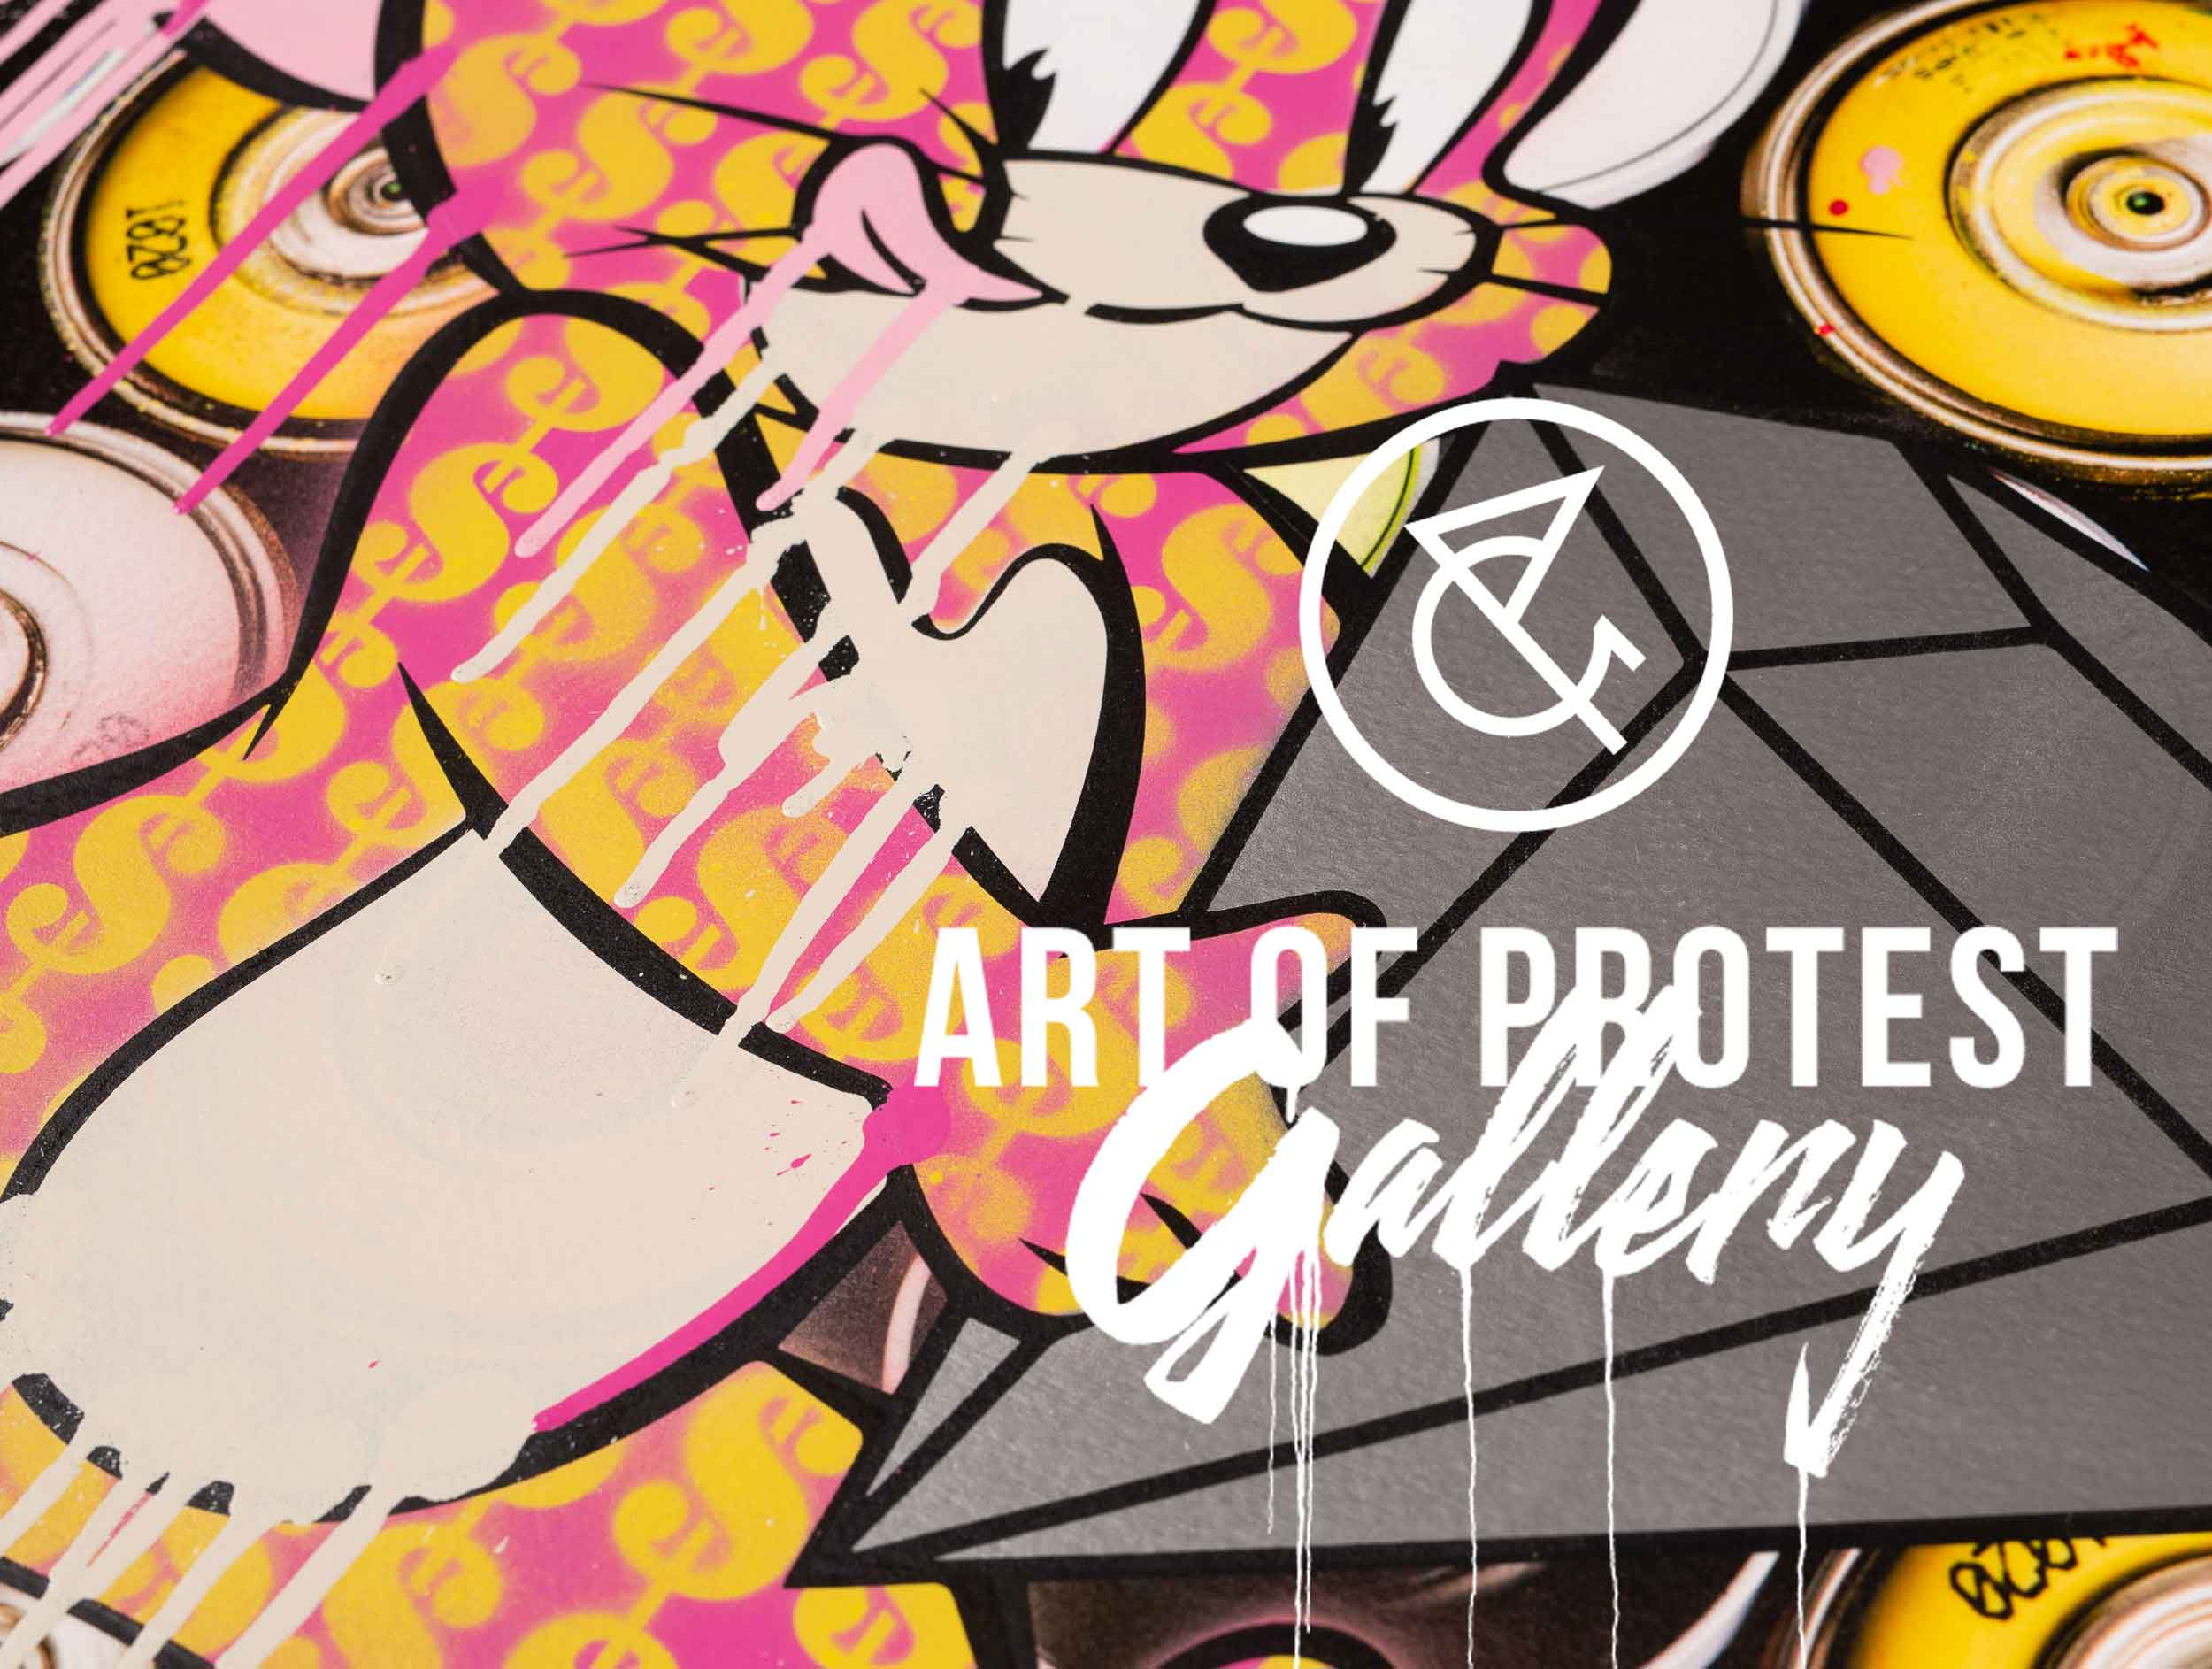 Art-Of-Protest-Gallery.jpg